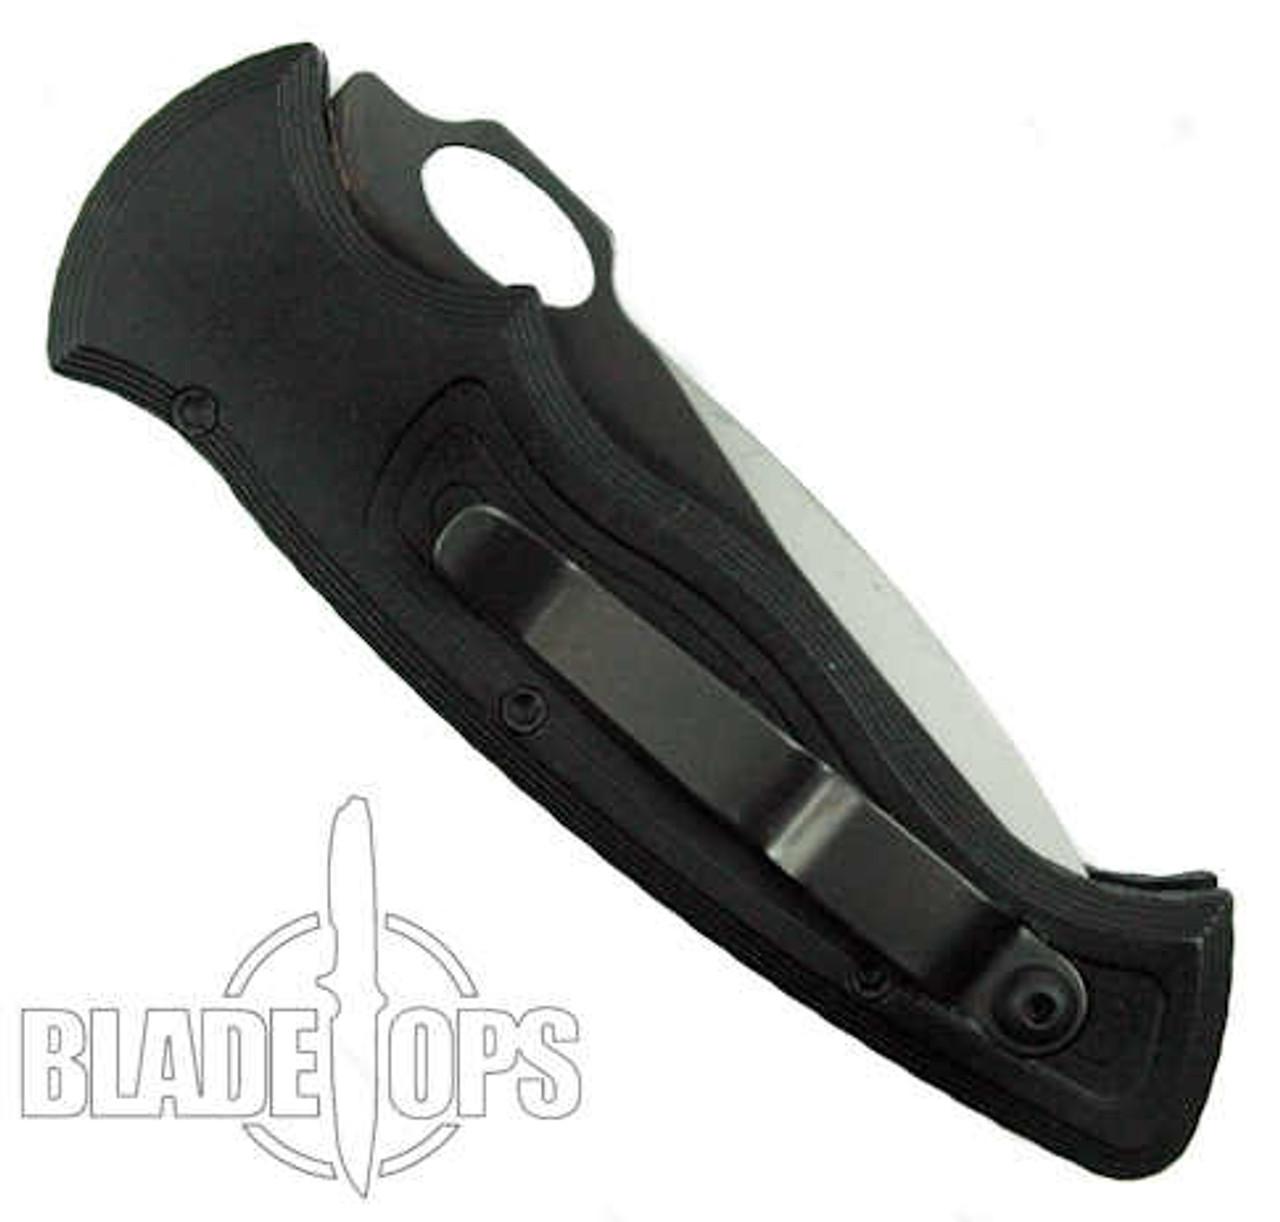 Piranha Hybrid Auto Knife, 154CM Black Combo Blade